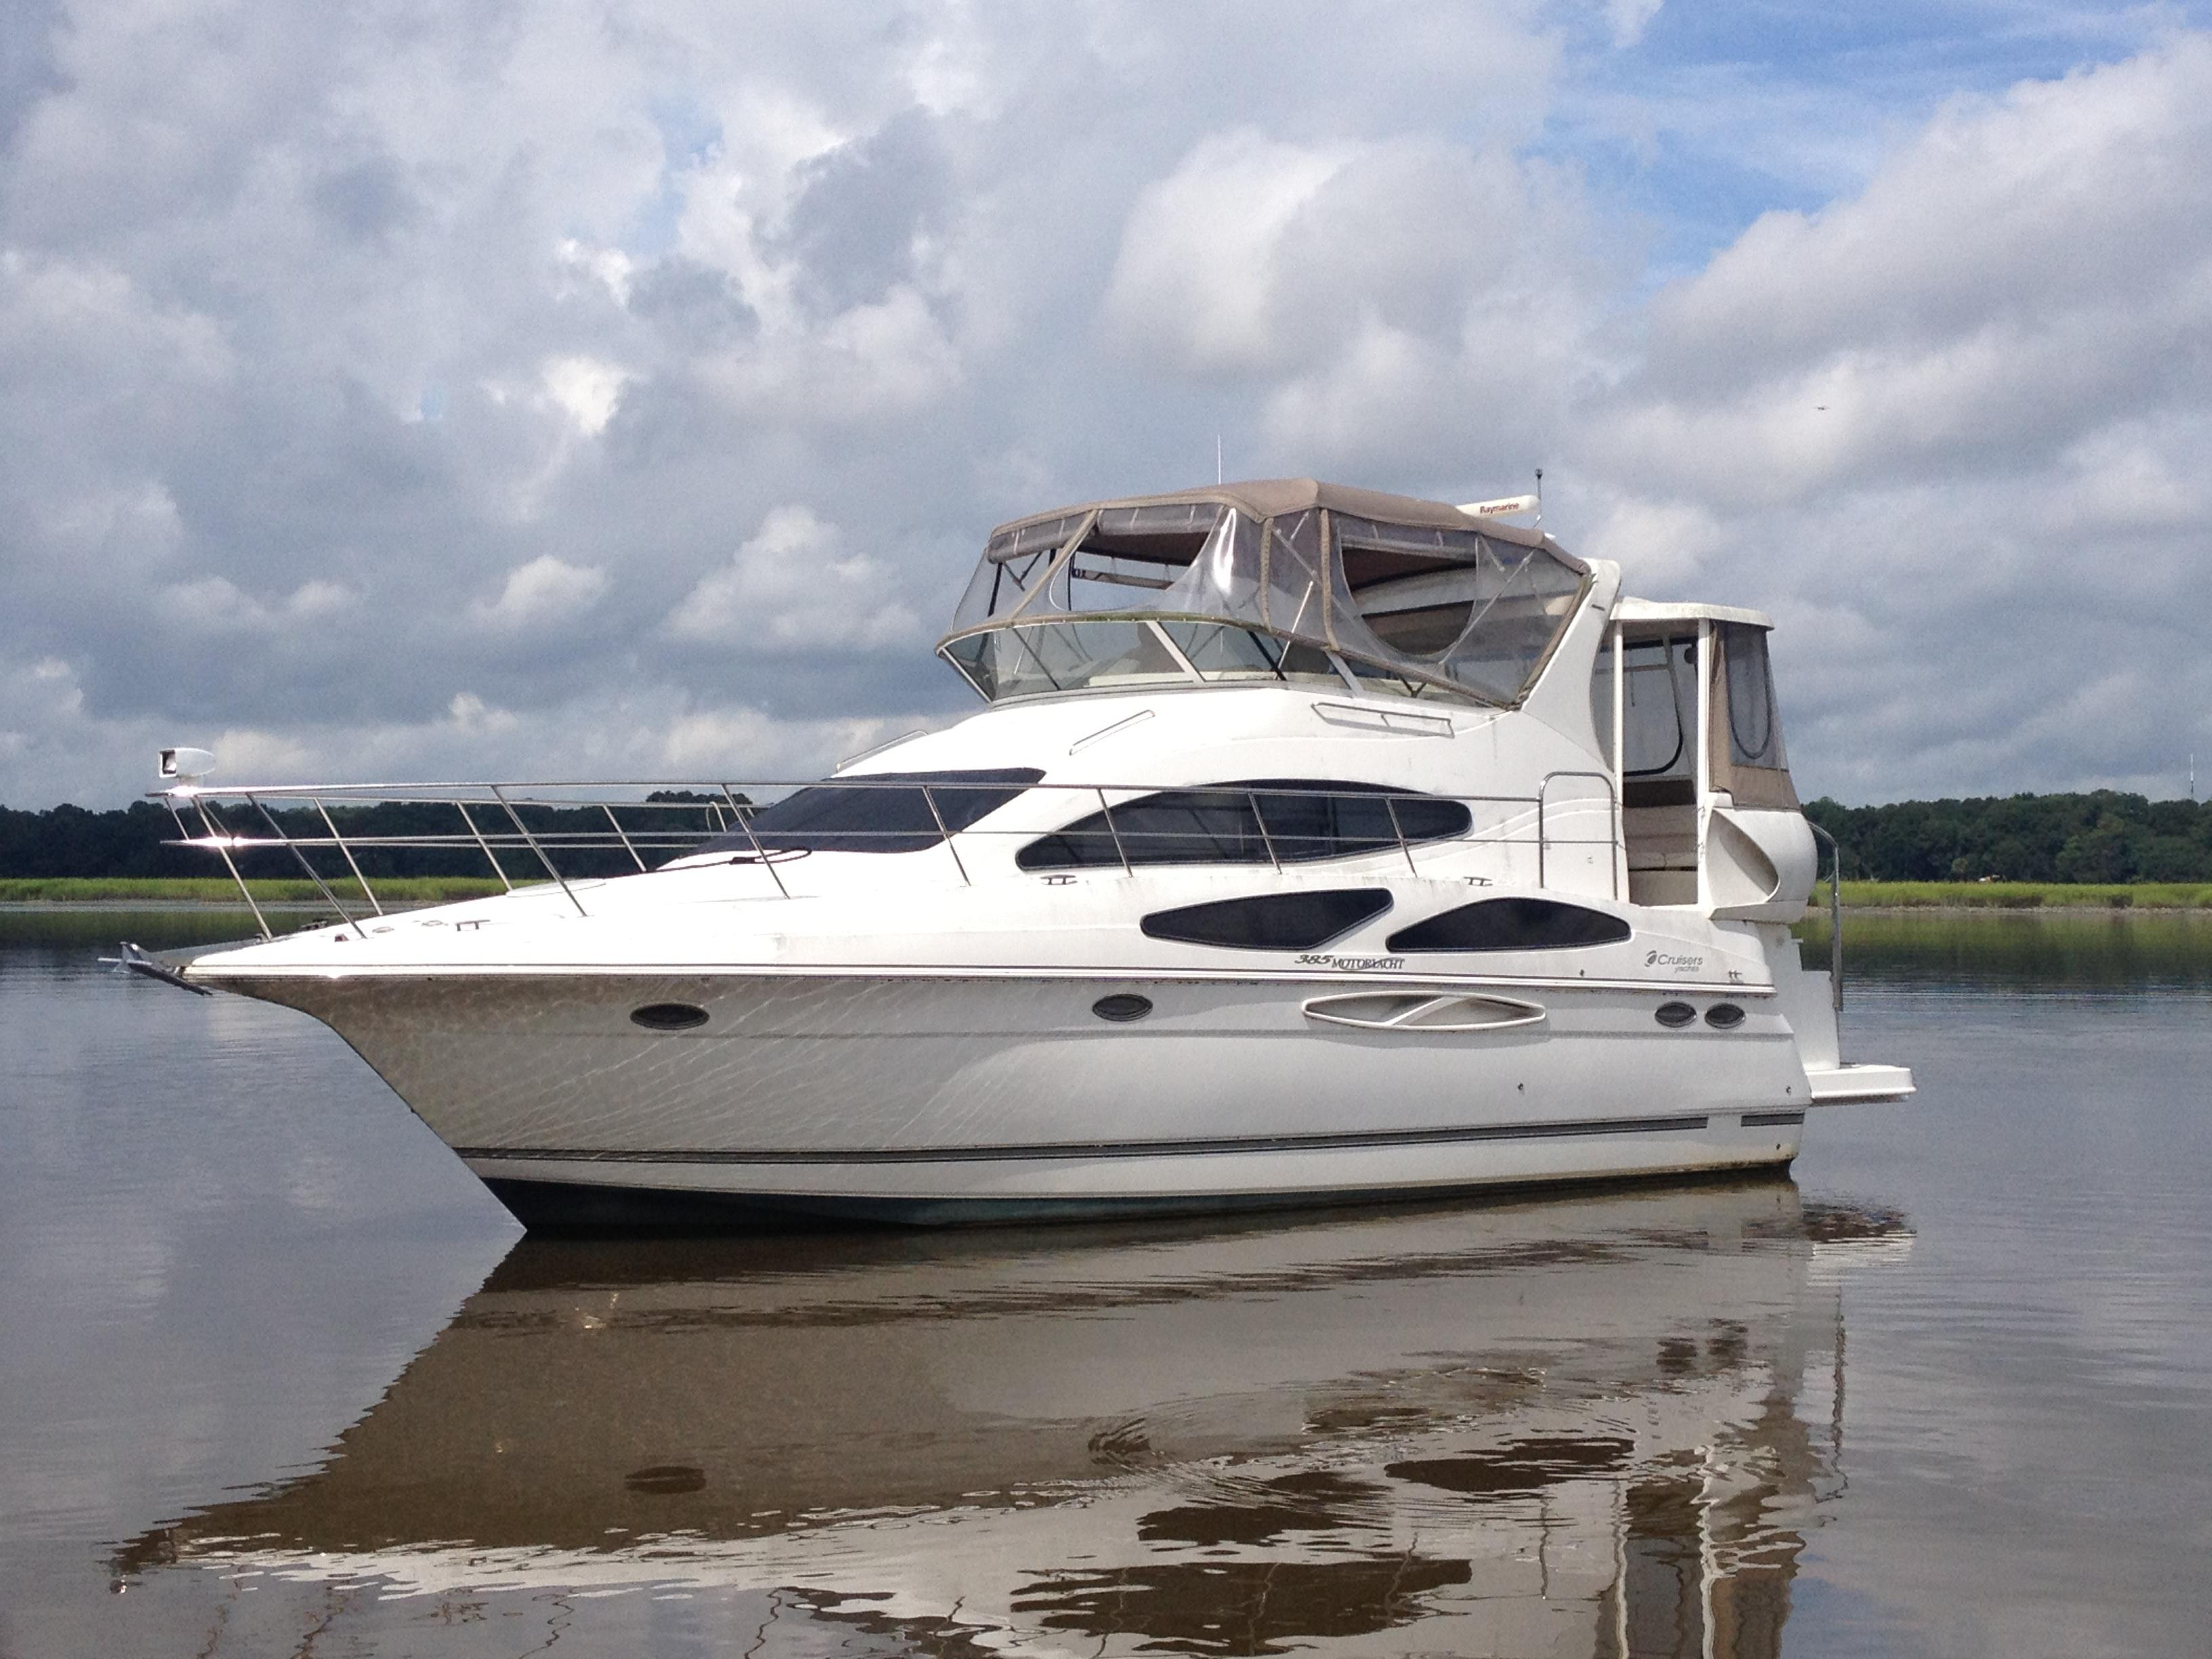 aft cabin cruiser  38 foot boats for sale in sc boat listings  larson delta boat cabin cruiser